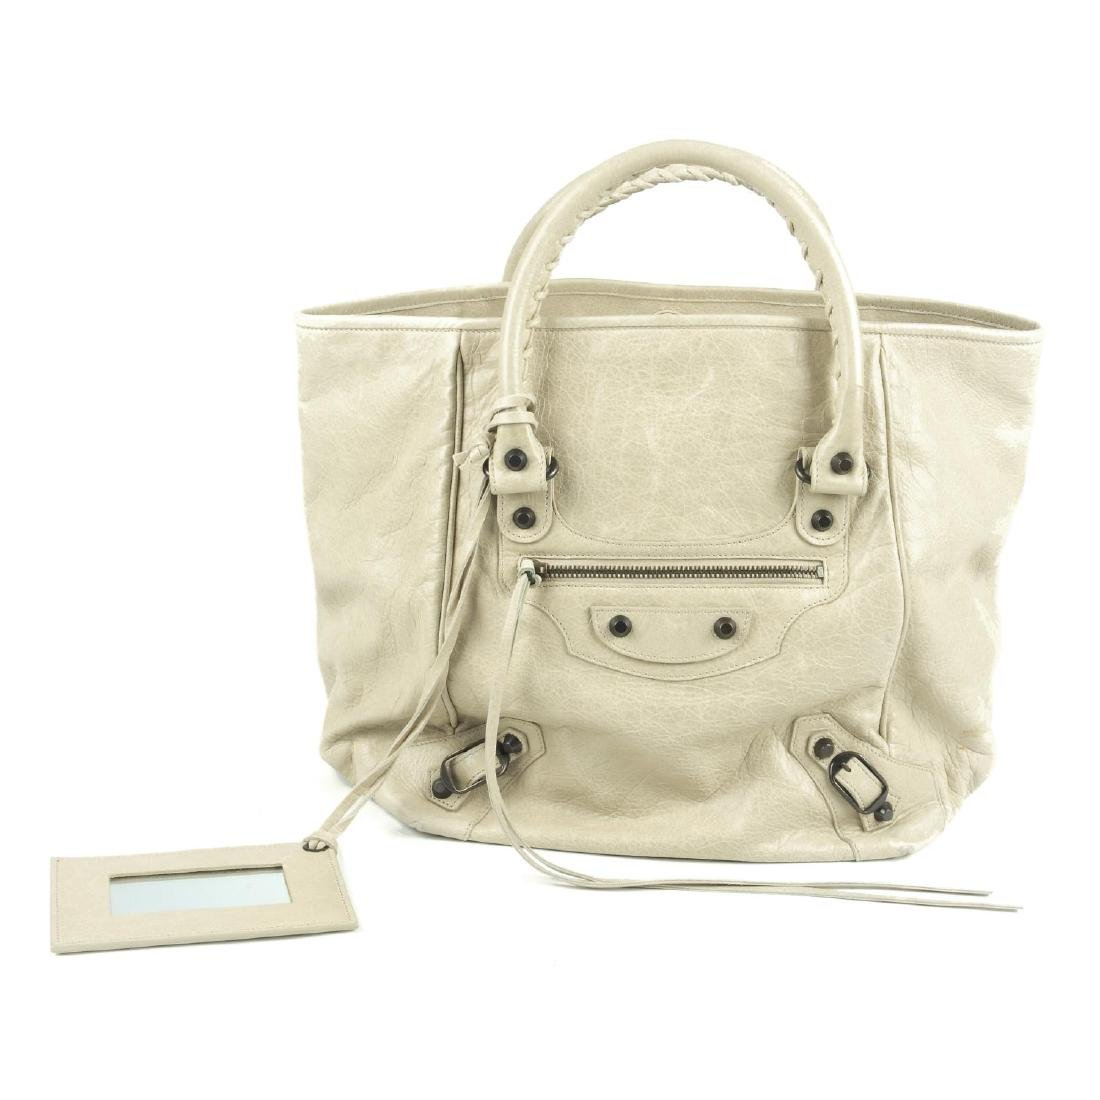 BALENCIAGA - a beige Sunday Tote handbag. Crafted from